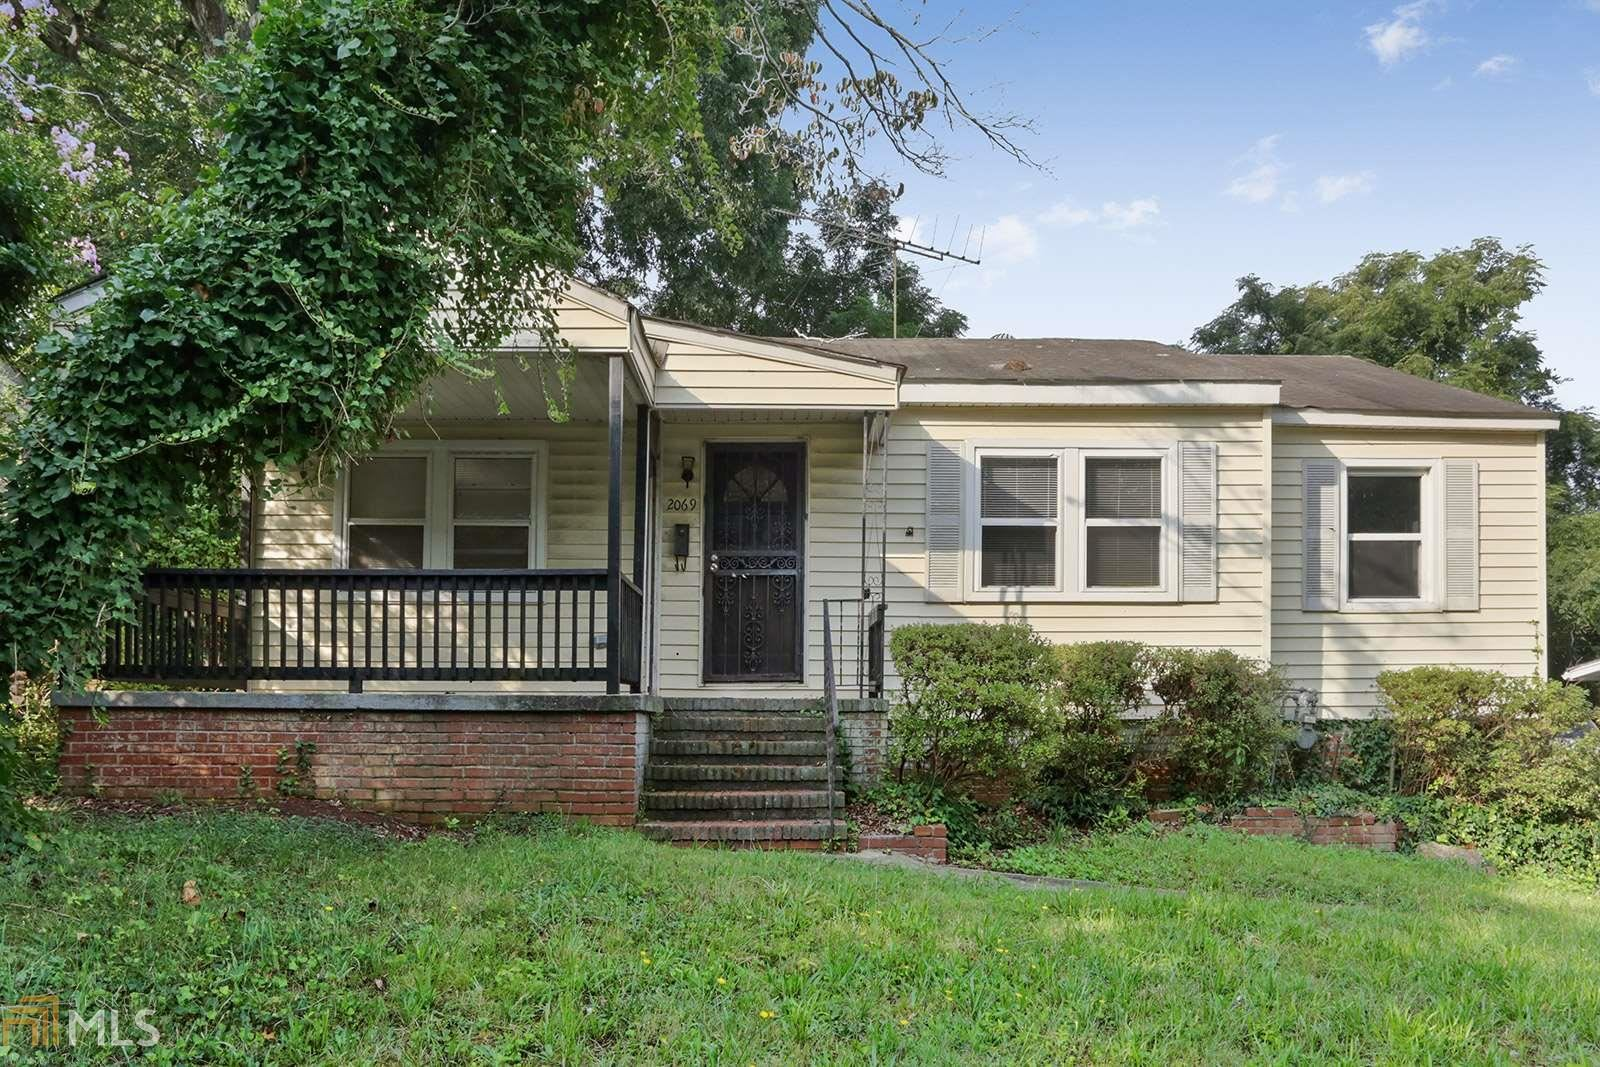 2069 Perkerson Rd, Atlanta, GA 30310 - MLS#: 8846287